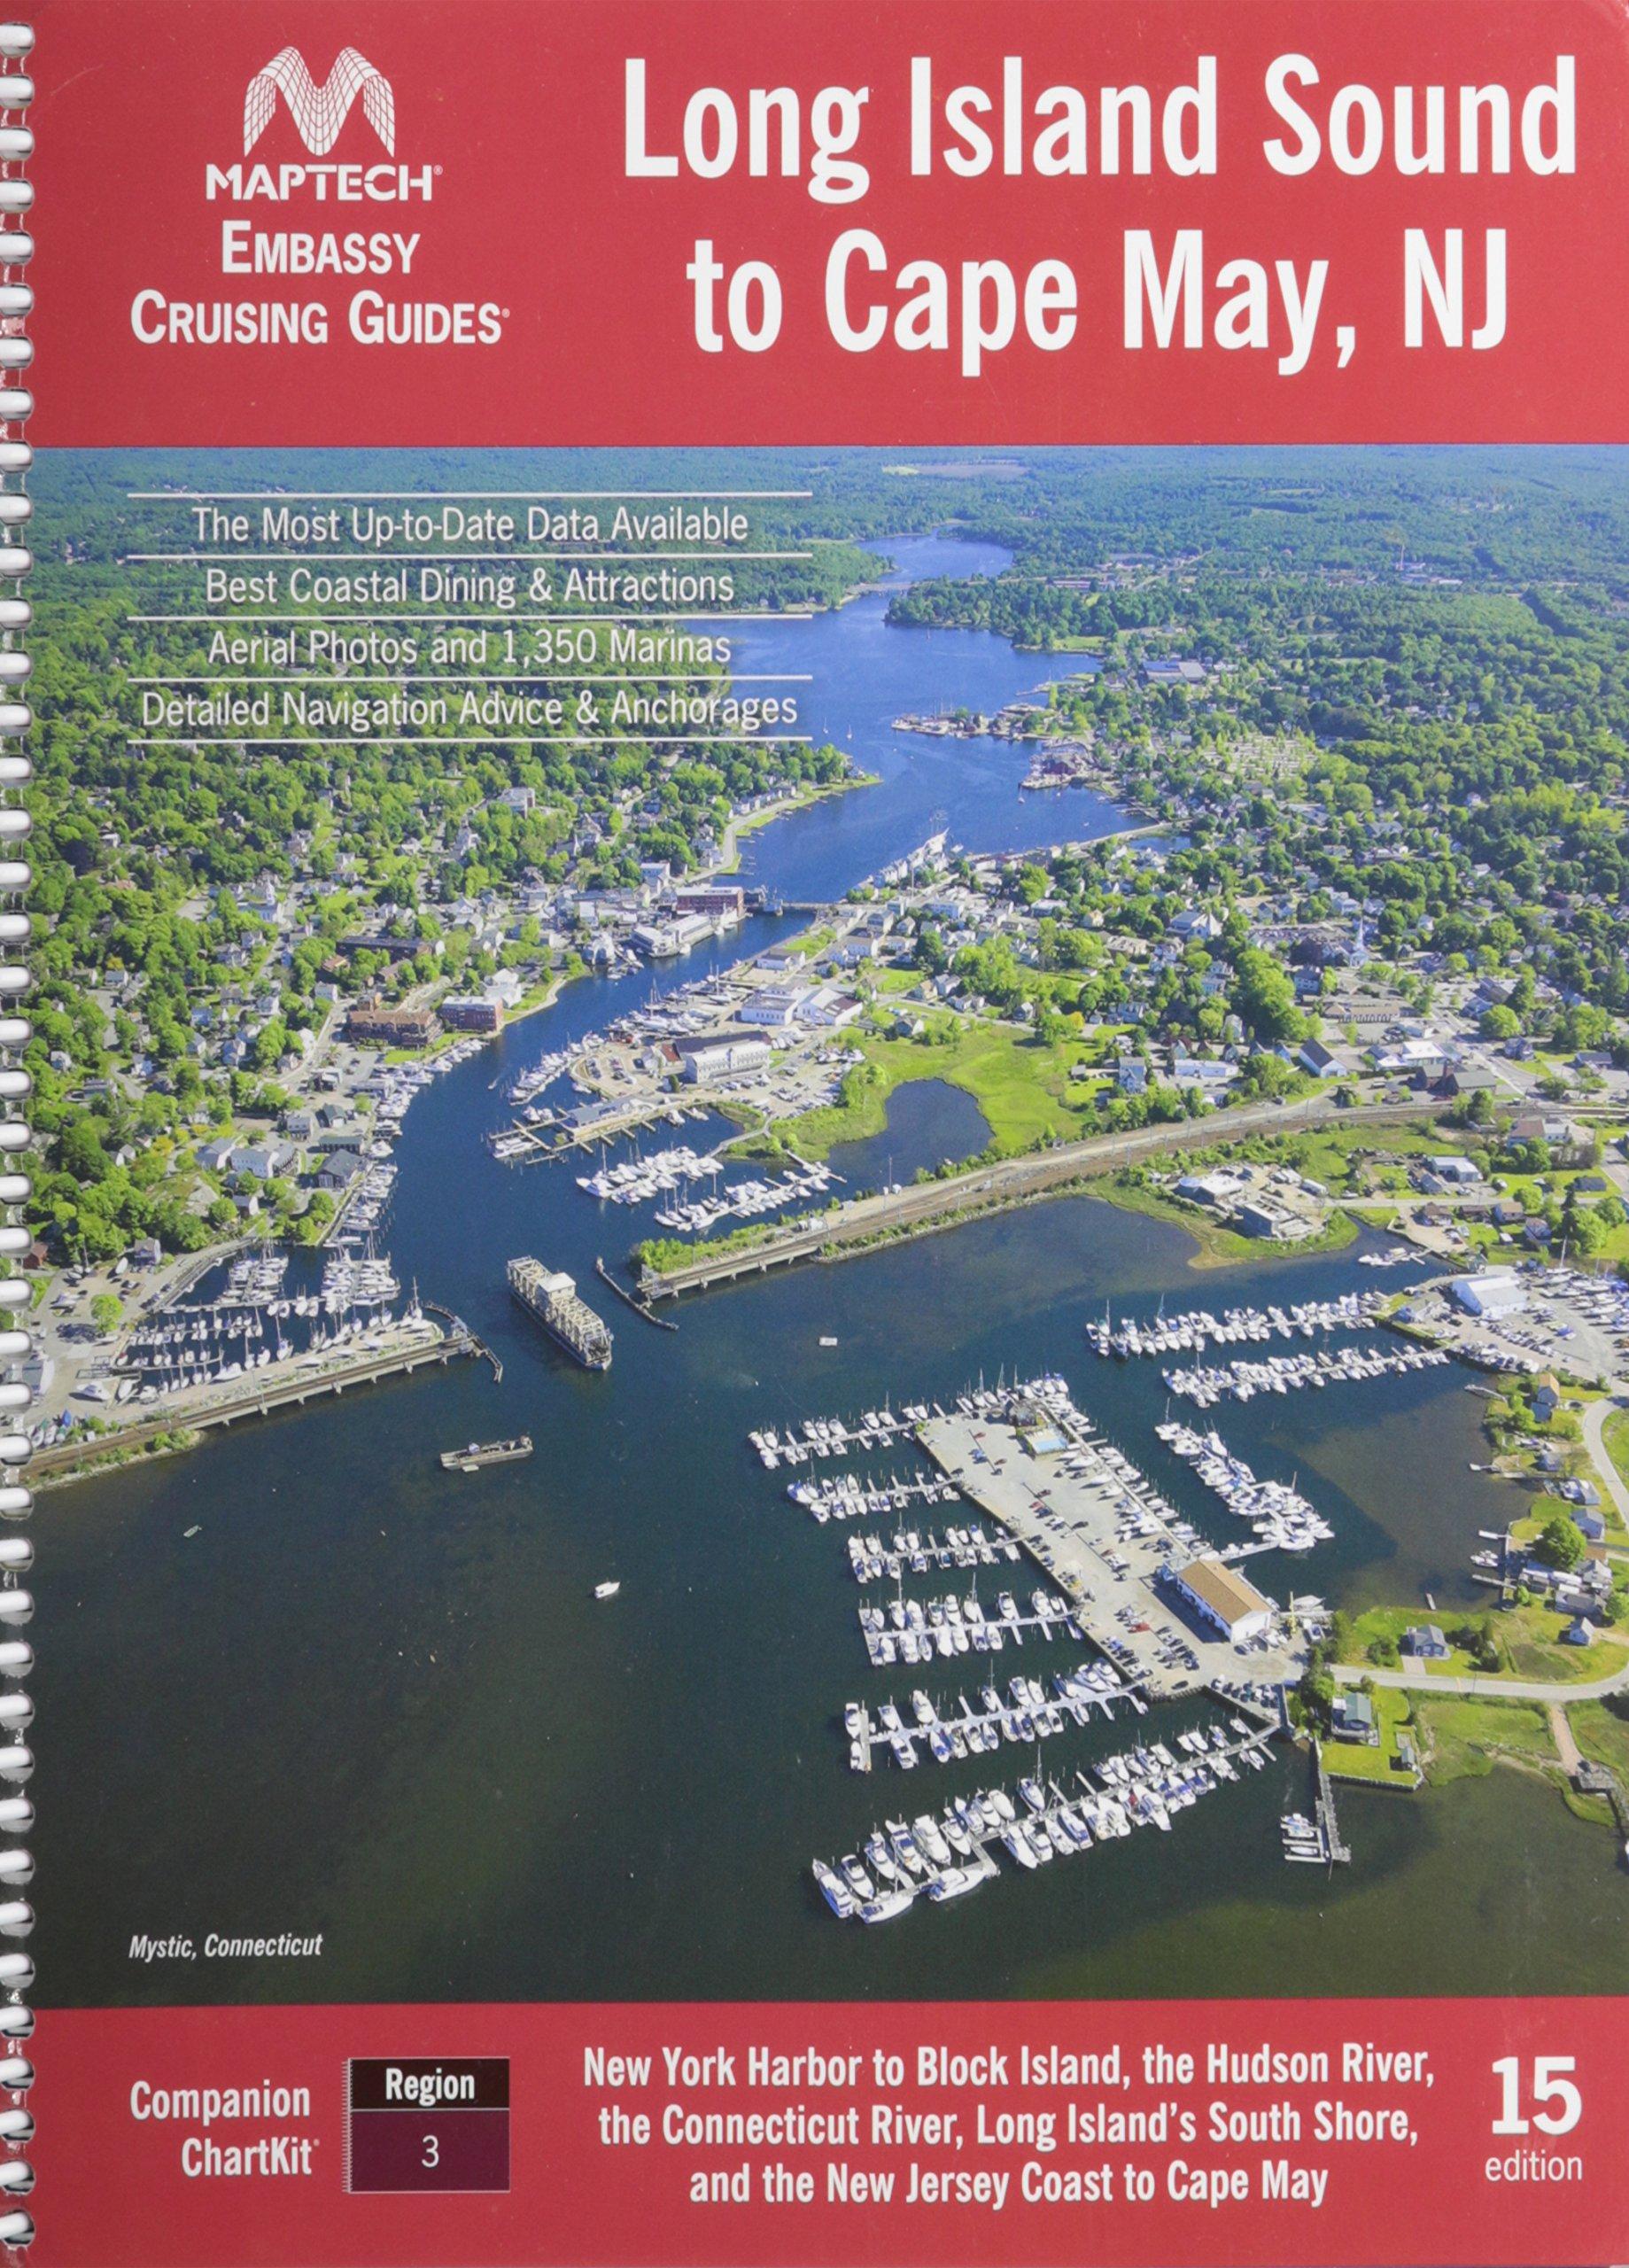 Embassy Cruising Guide: Long Island Sound, 15th Edition